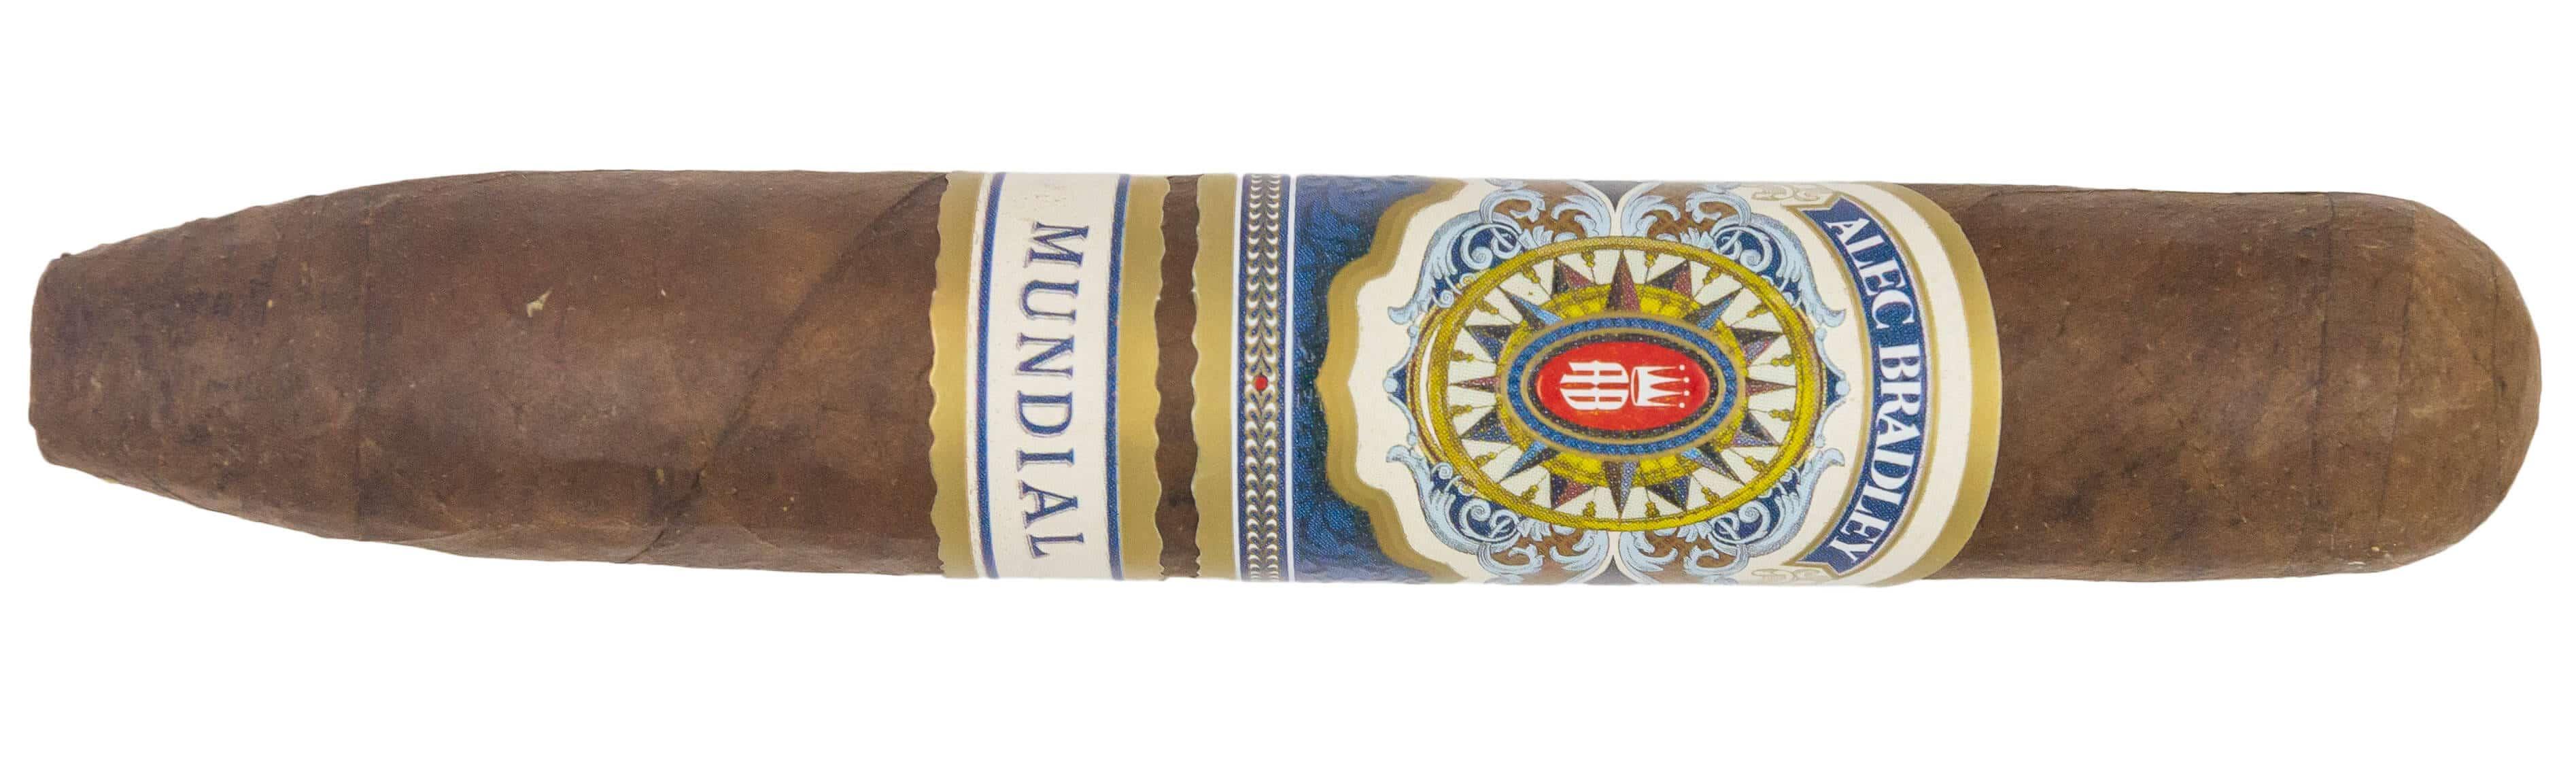 Blind Cigar Review: Alec Bradley | Mundial Punta Lanza No. 5